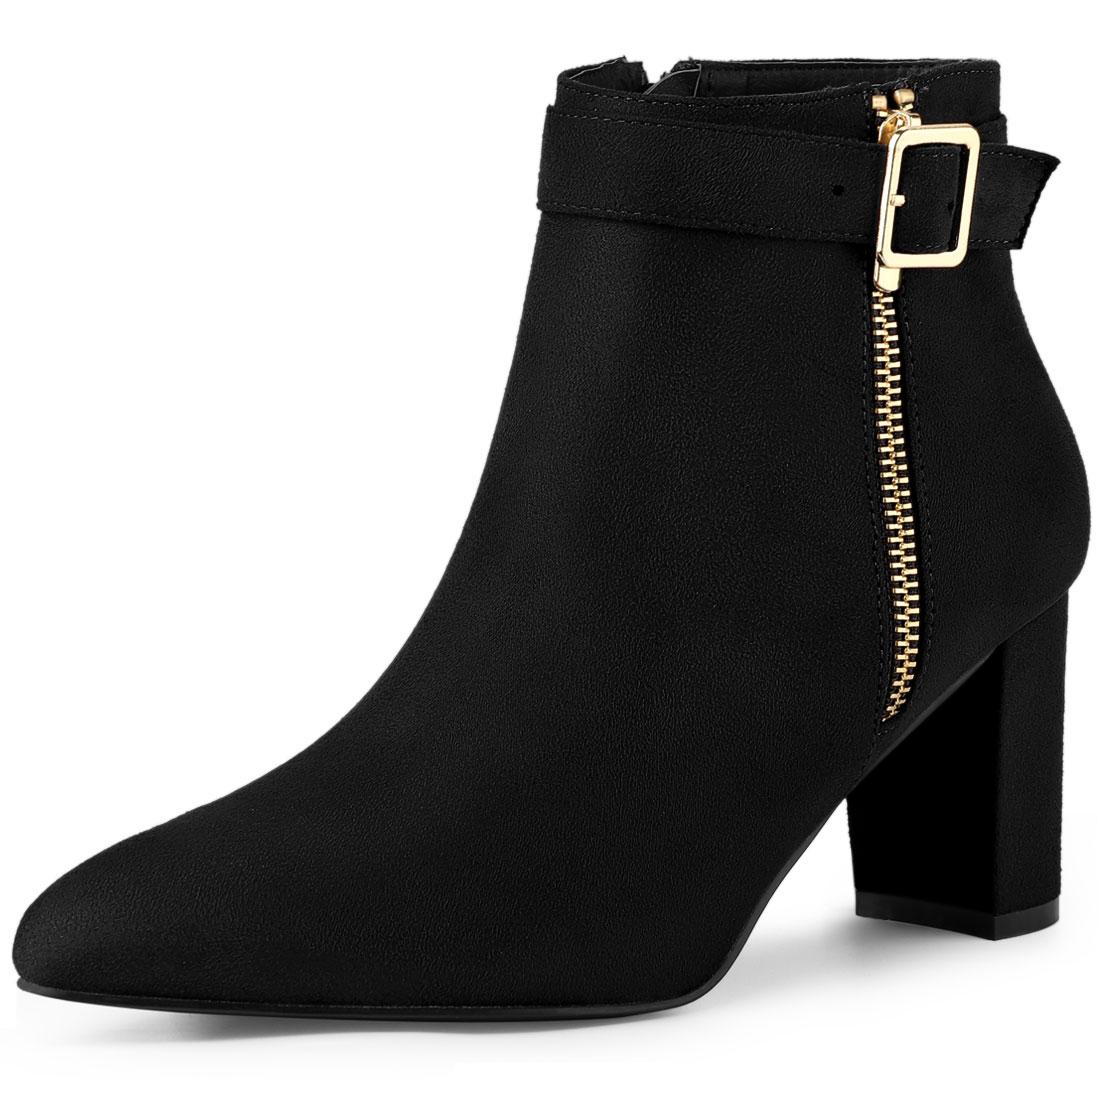 Allegra K Women's Pointed Toe Buckle Chunky Heel Ankle Booties Black US 10